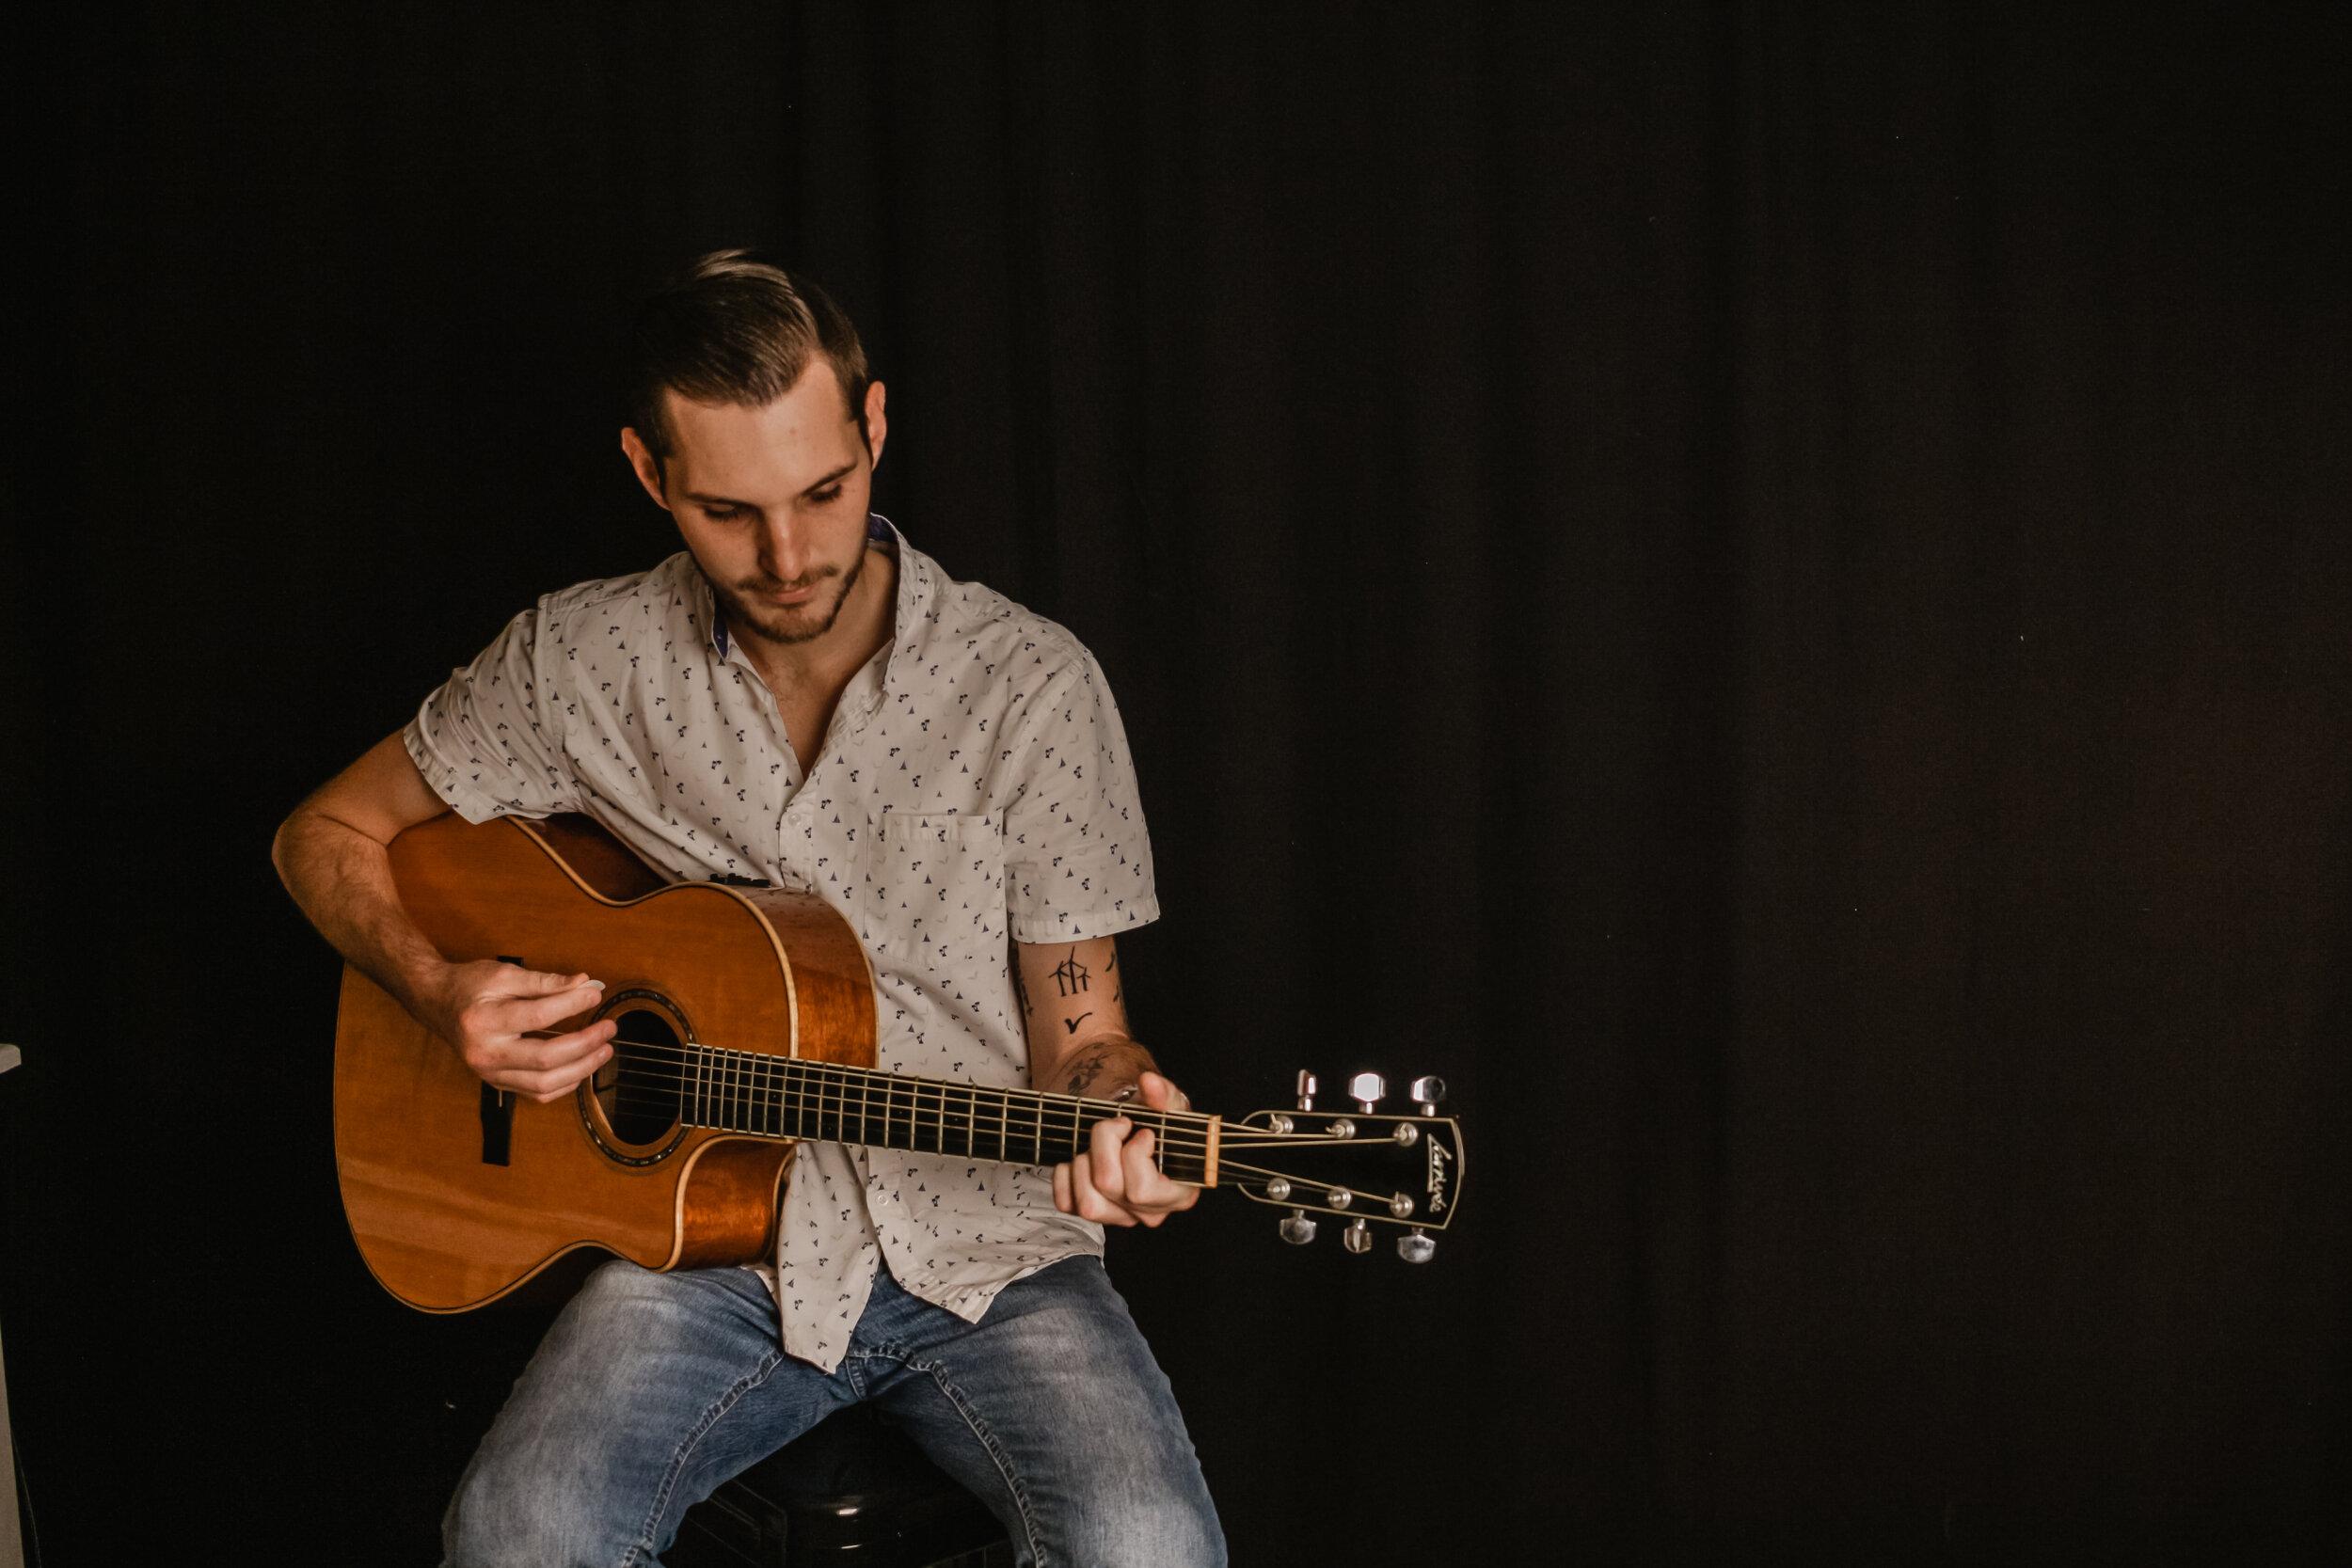 Tutoriales de Guitarra -